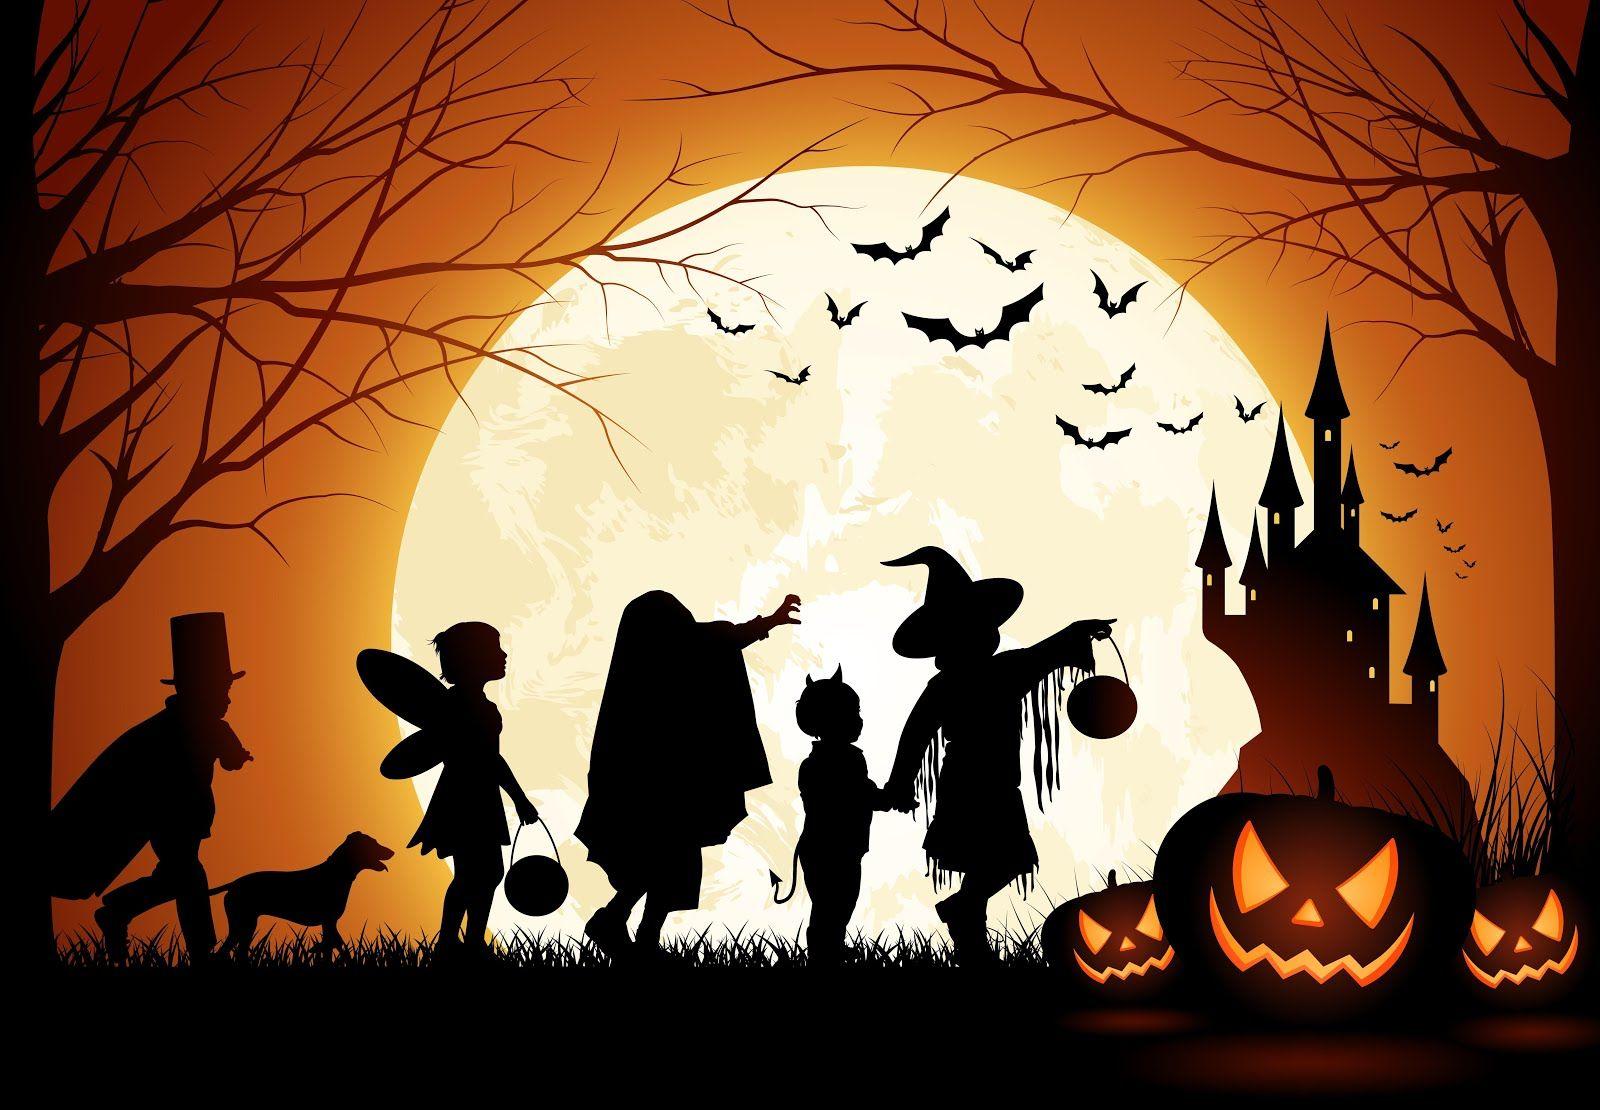 Frasi Halloween Paurose.60 Stati Per Halloween Frasi E Immagini Paurose E Divertenti Whatsapp Web Whatsappare Halloween Silhouettes Happy Halloween Pictures Halloween Images